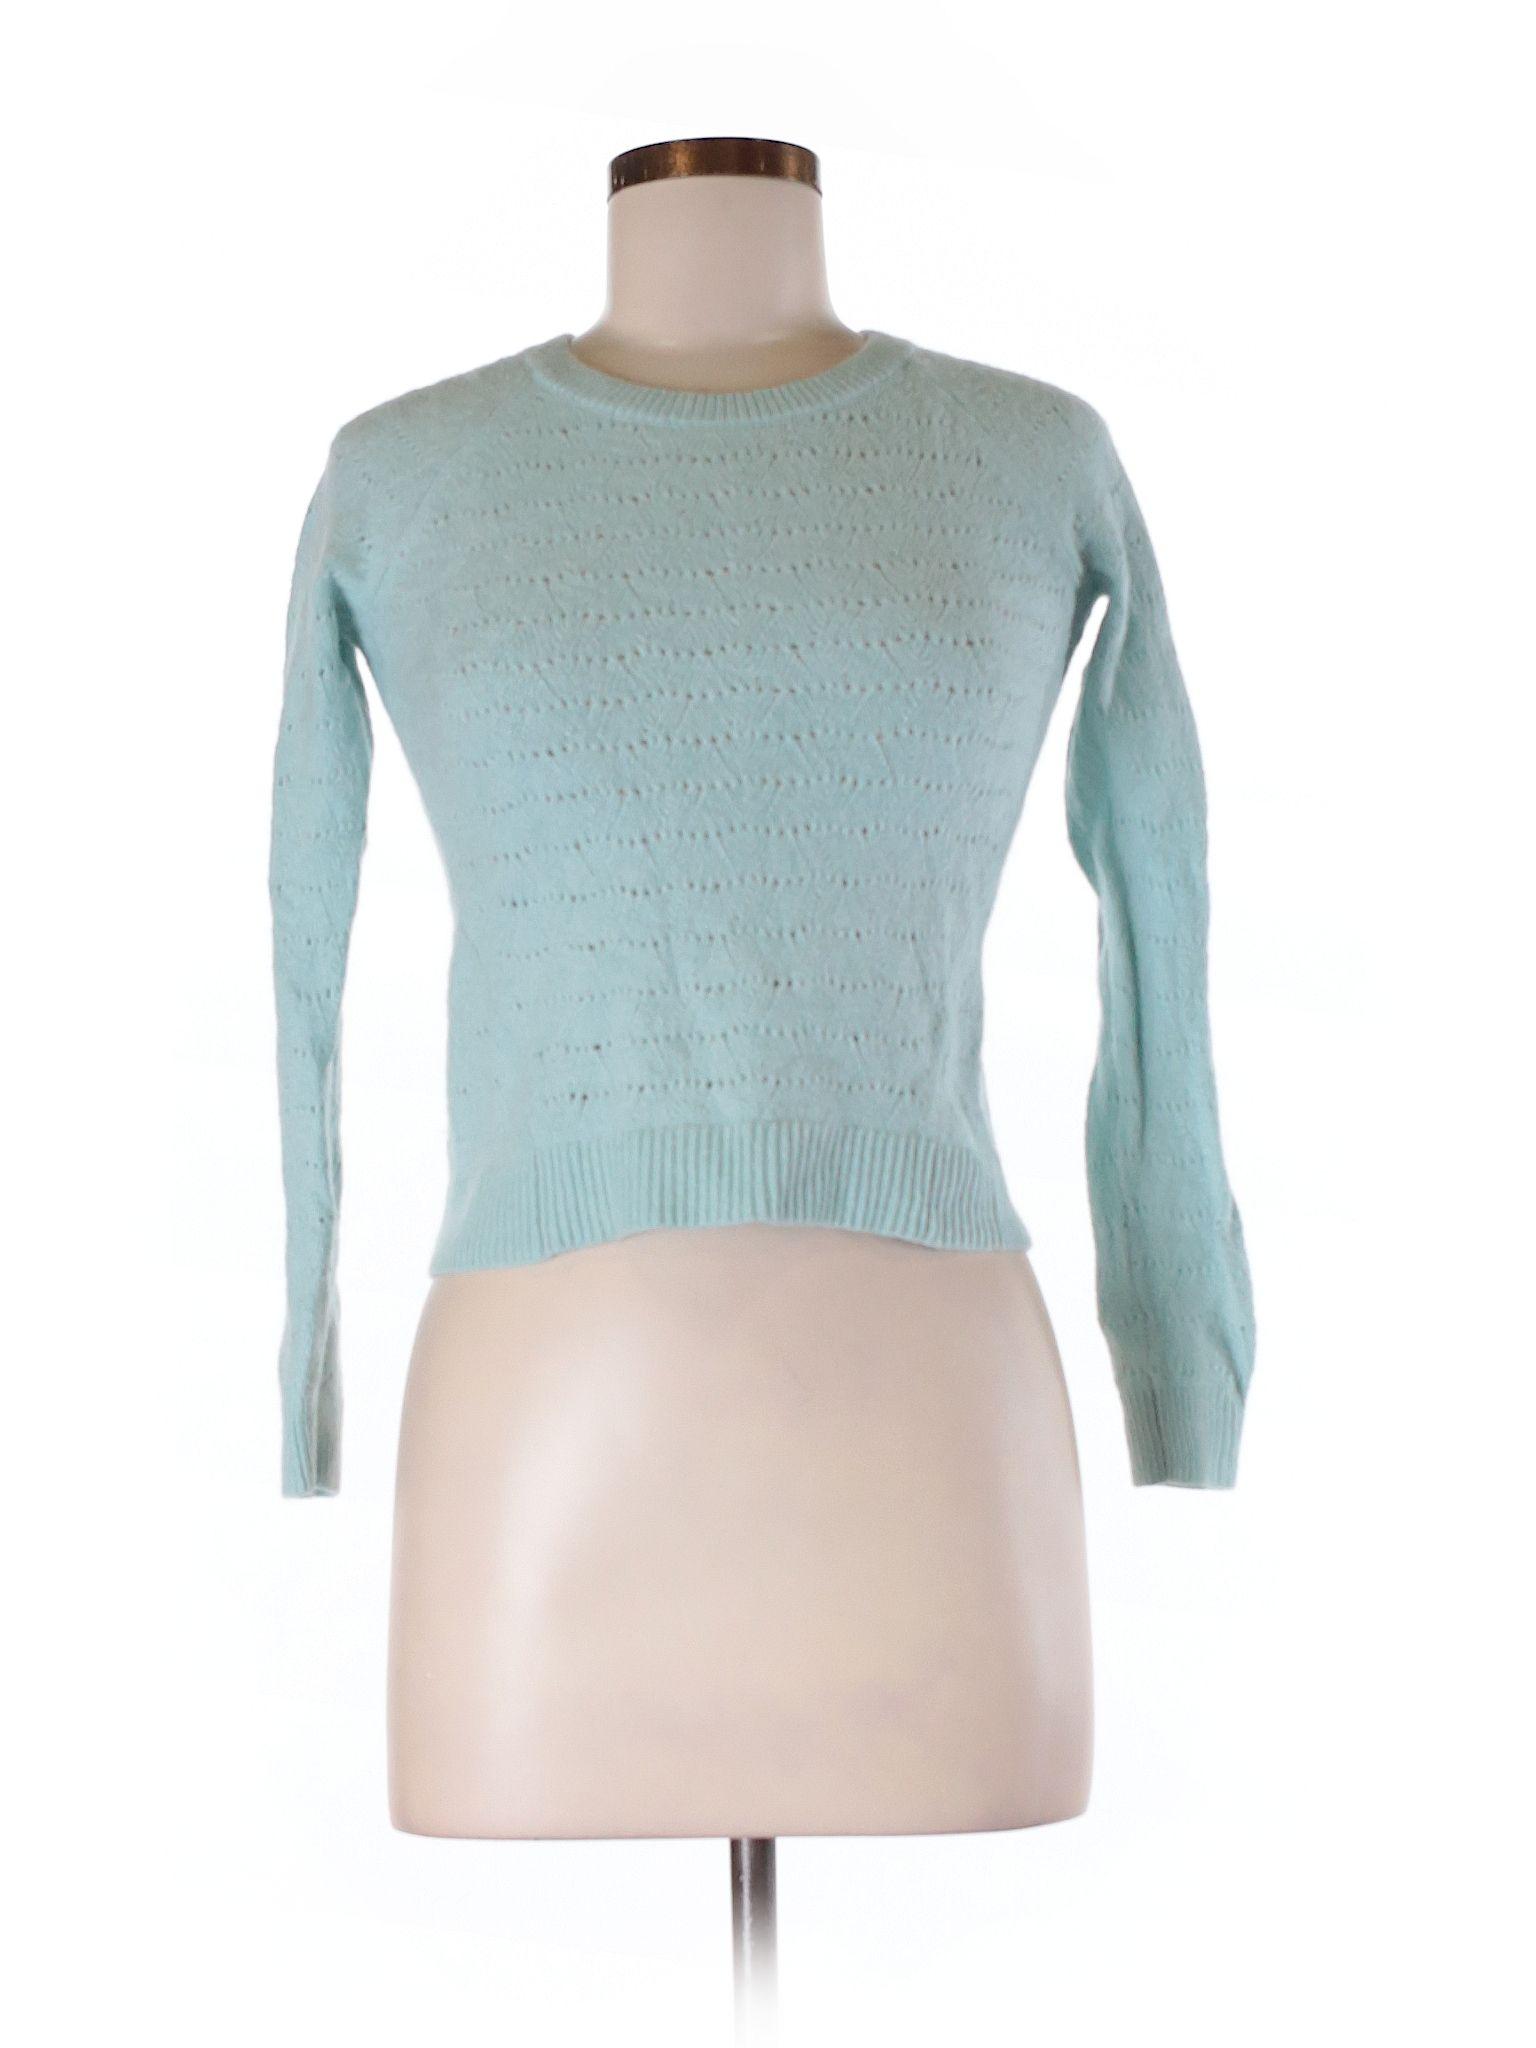 Ann Taylor Loft Pullover Sweater Size 400 Light Blue Womens